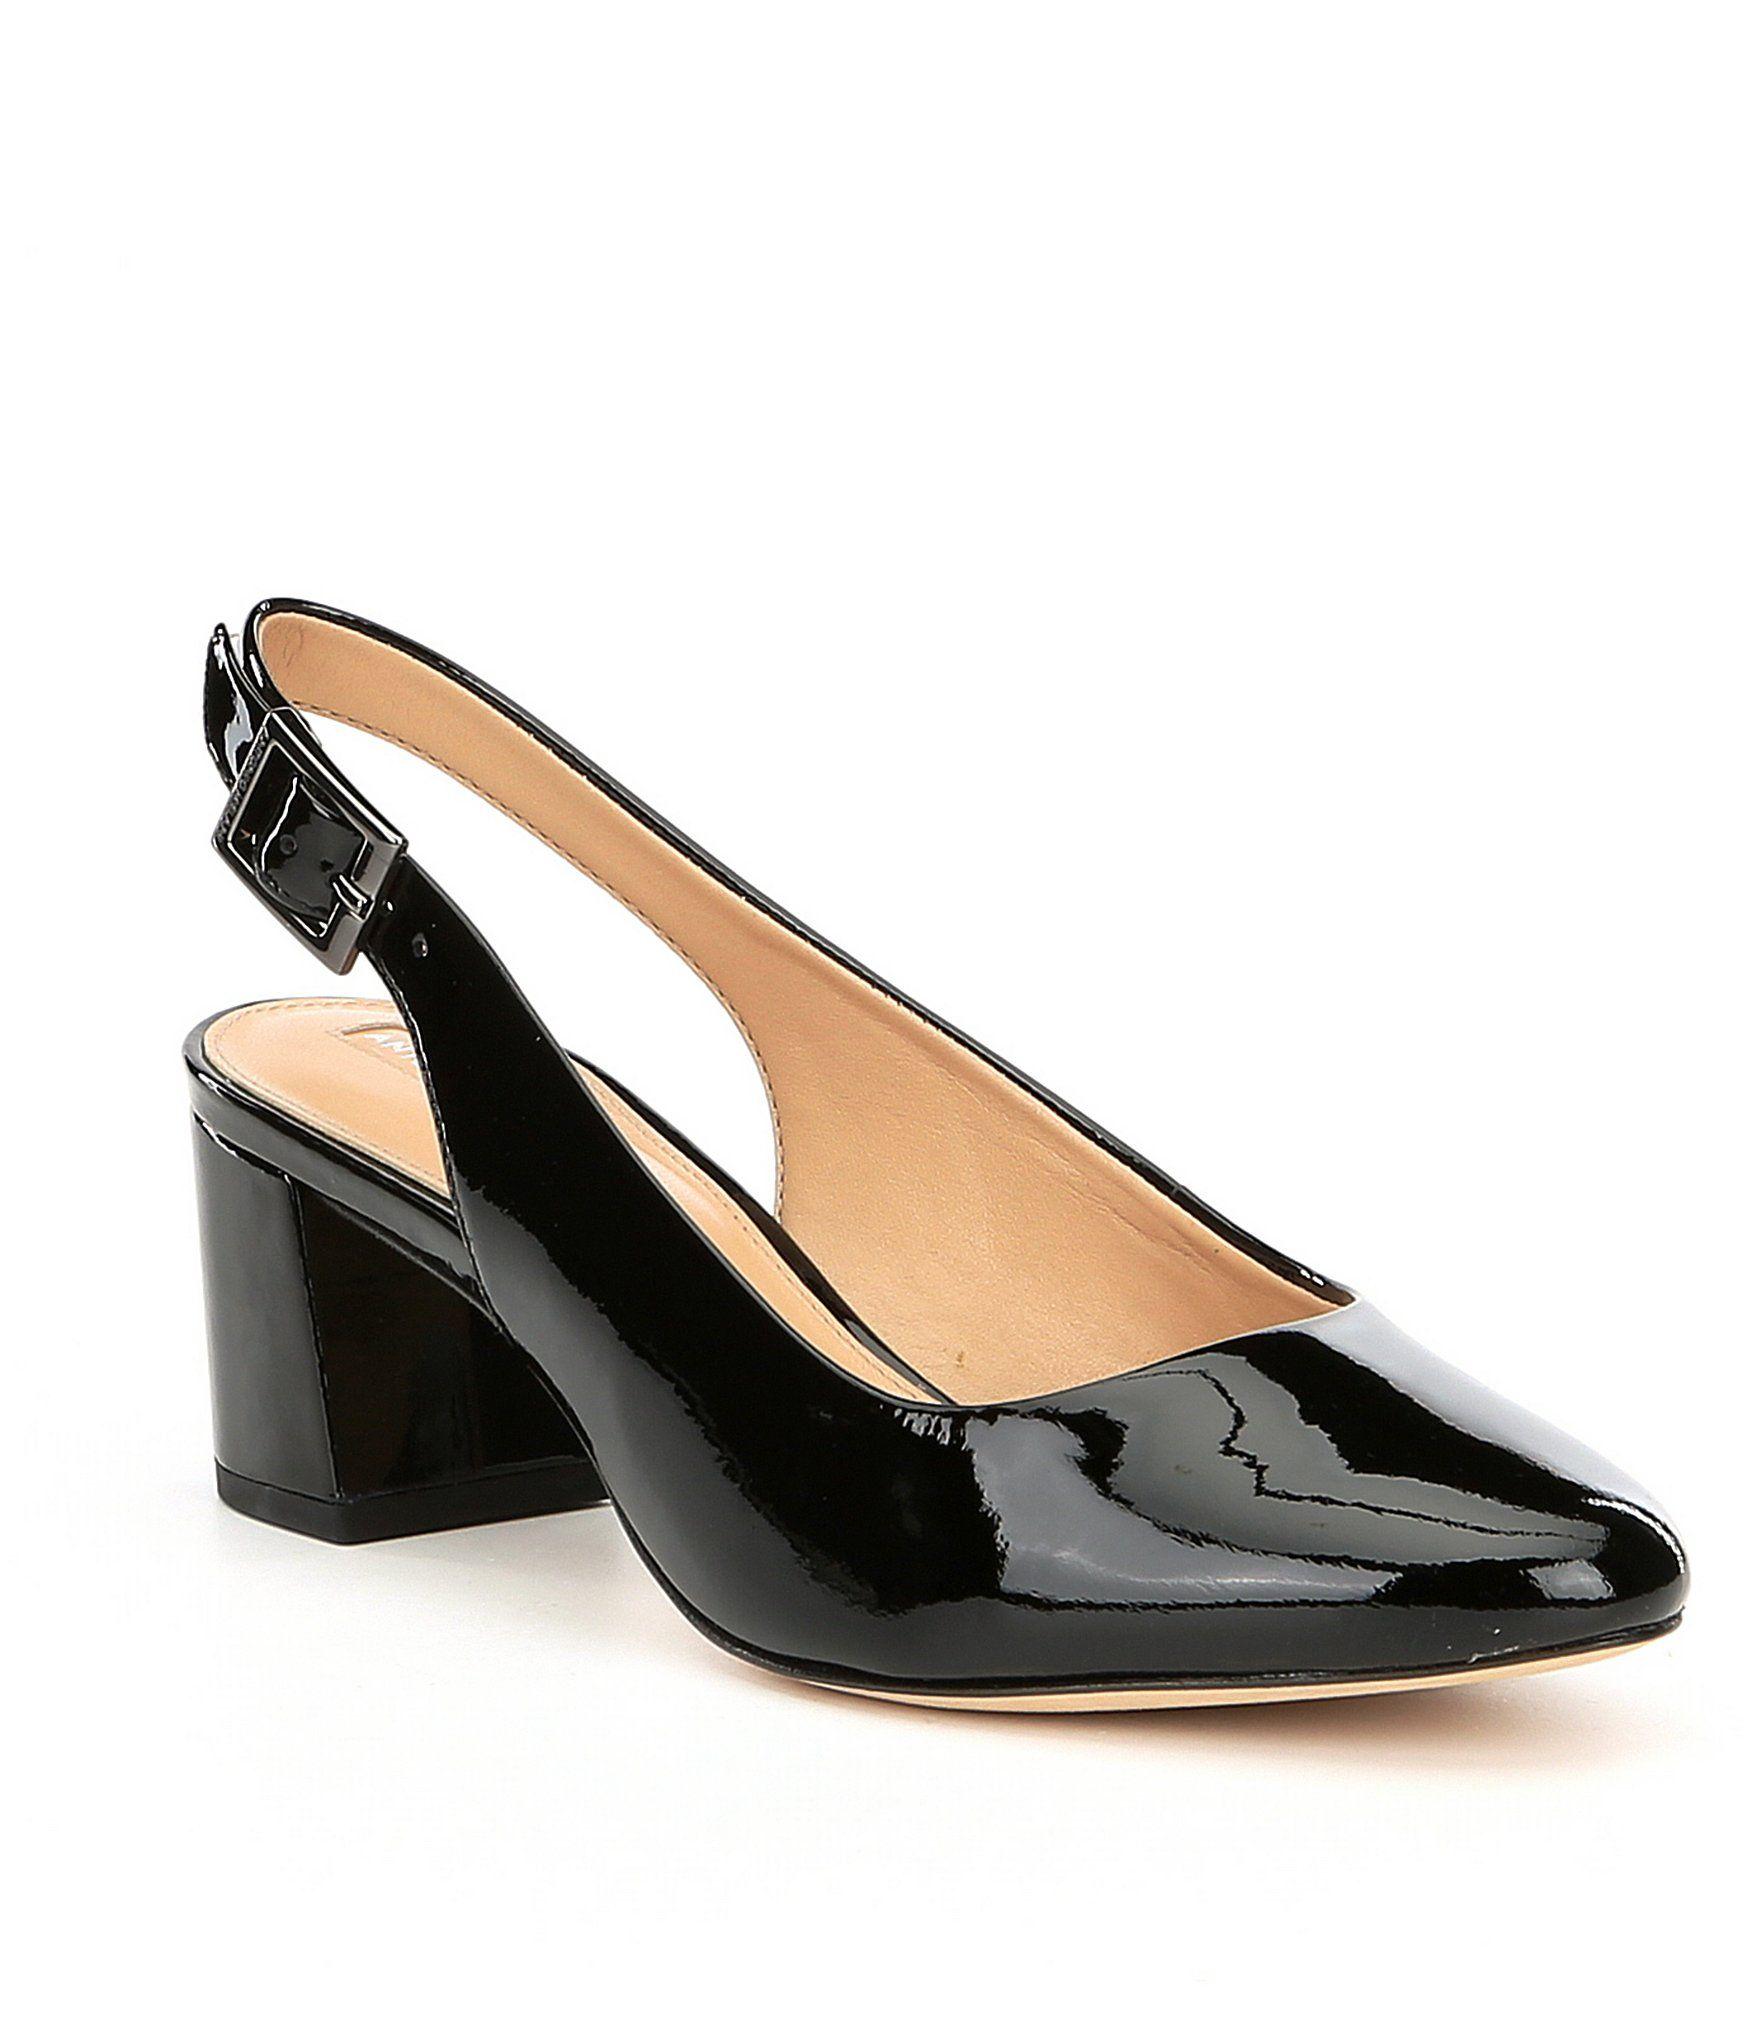 Antonio Melani Arian Patent Leather Slingback Block Heel Pumps YCrik